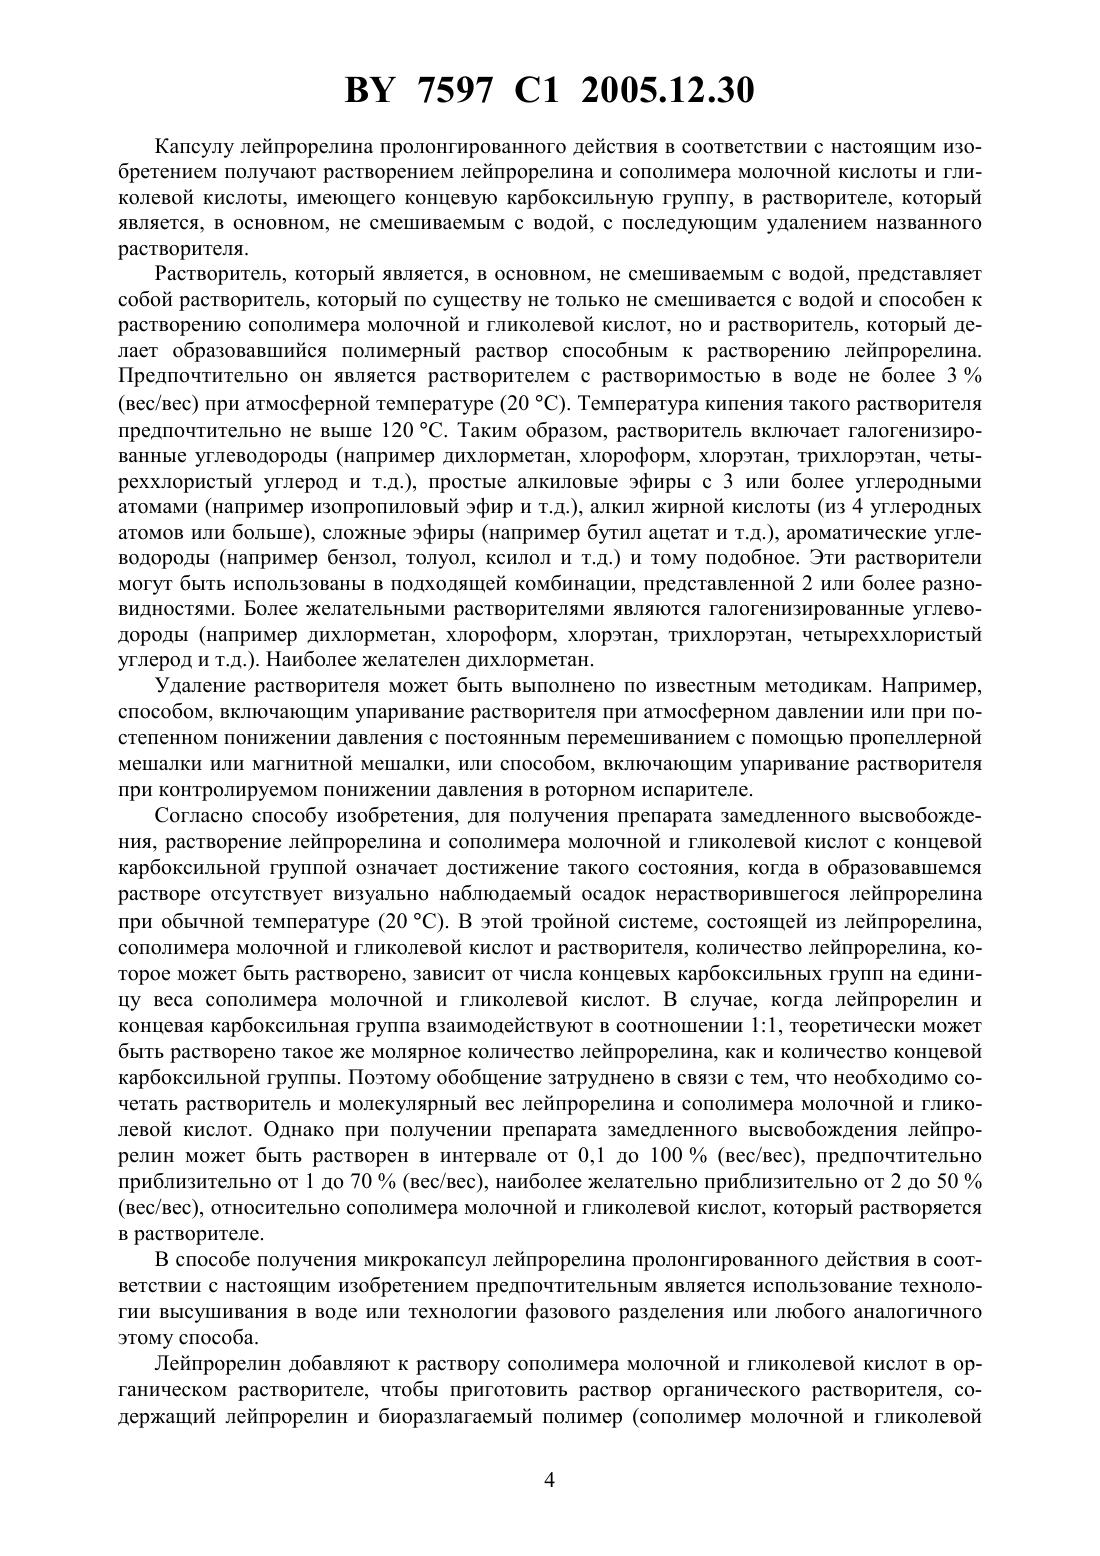 Лейпрорелин